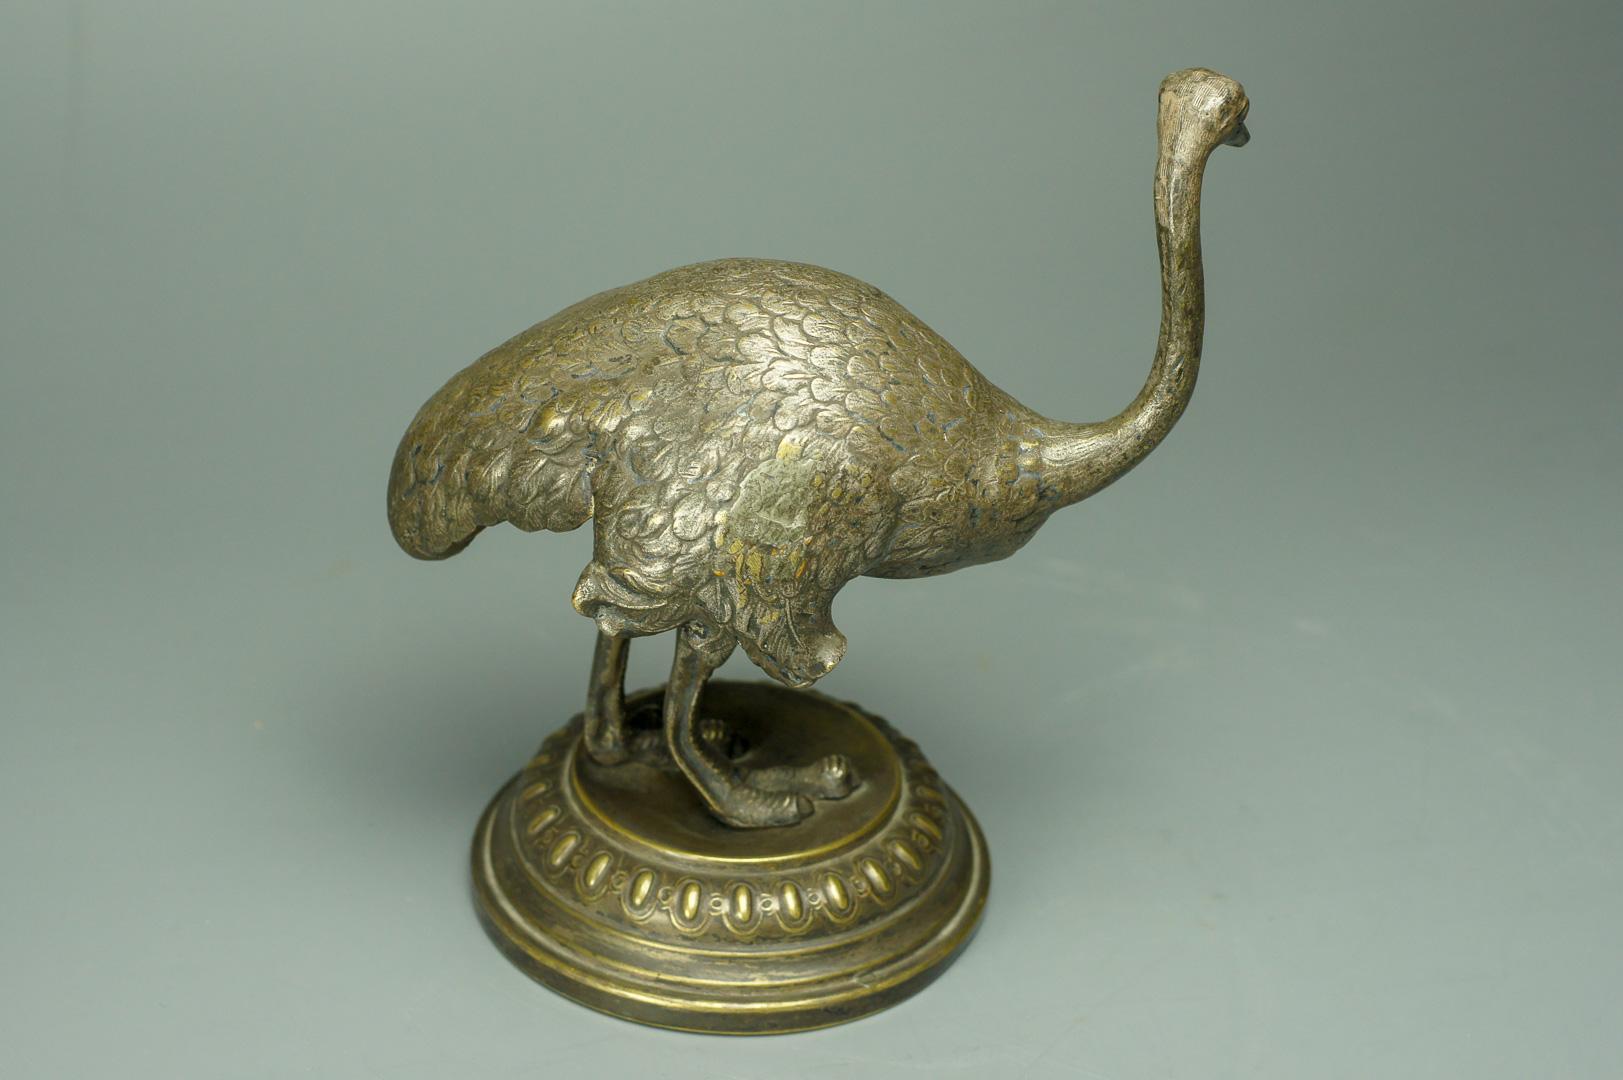 Статуэтка птица Эму Варшава